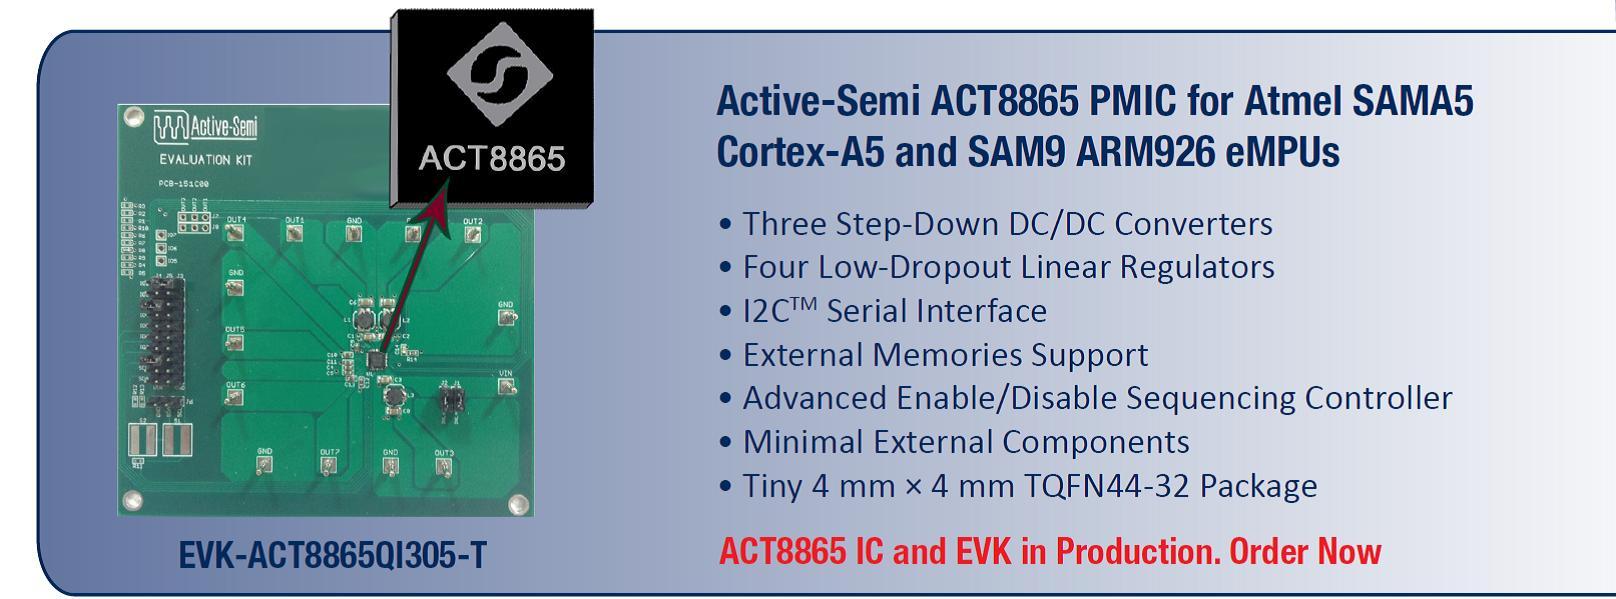 Active-Semi ACT8865